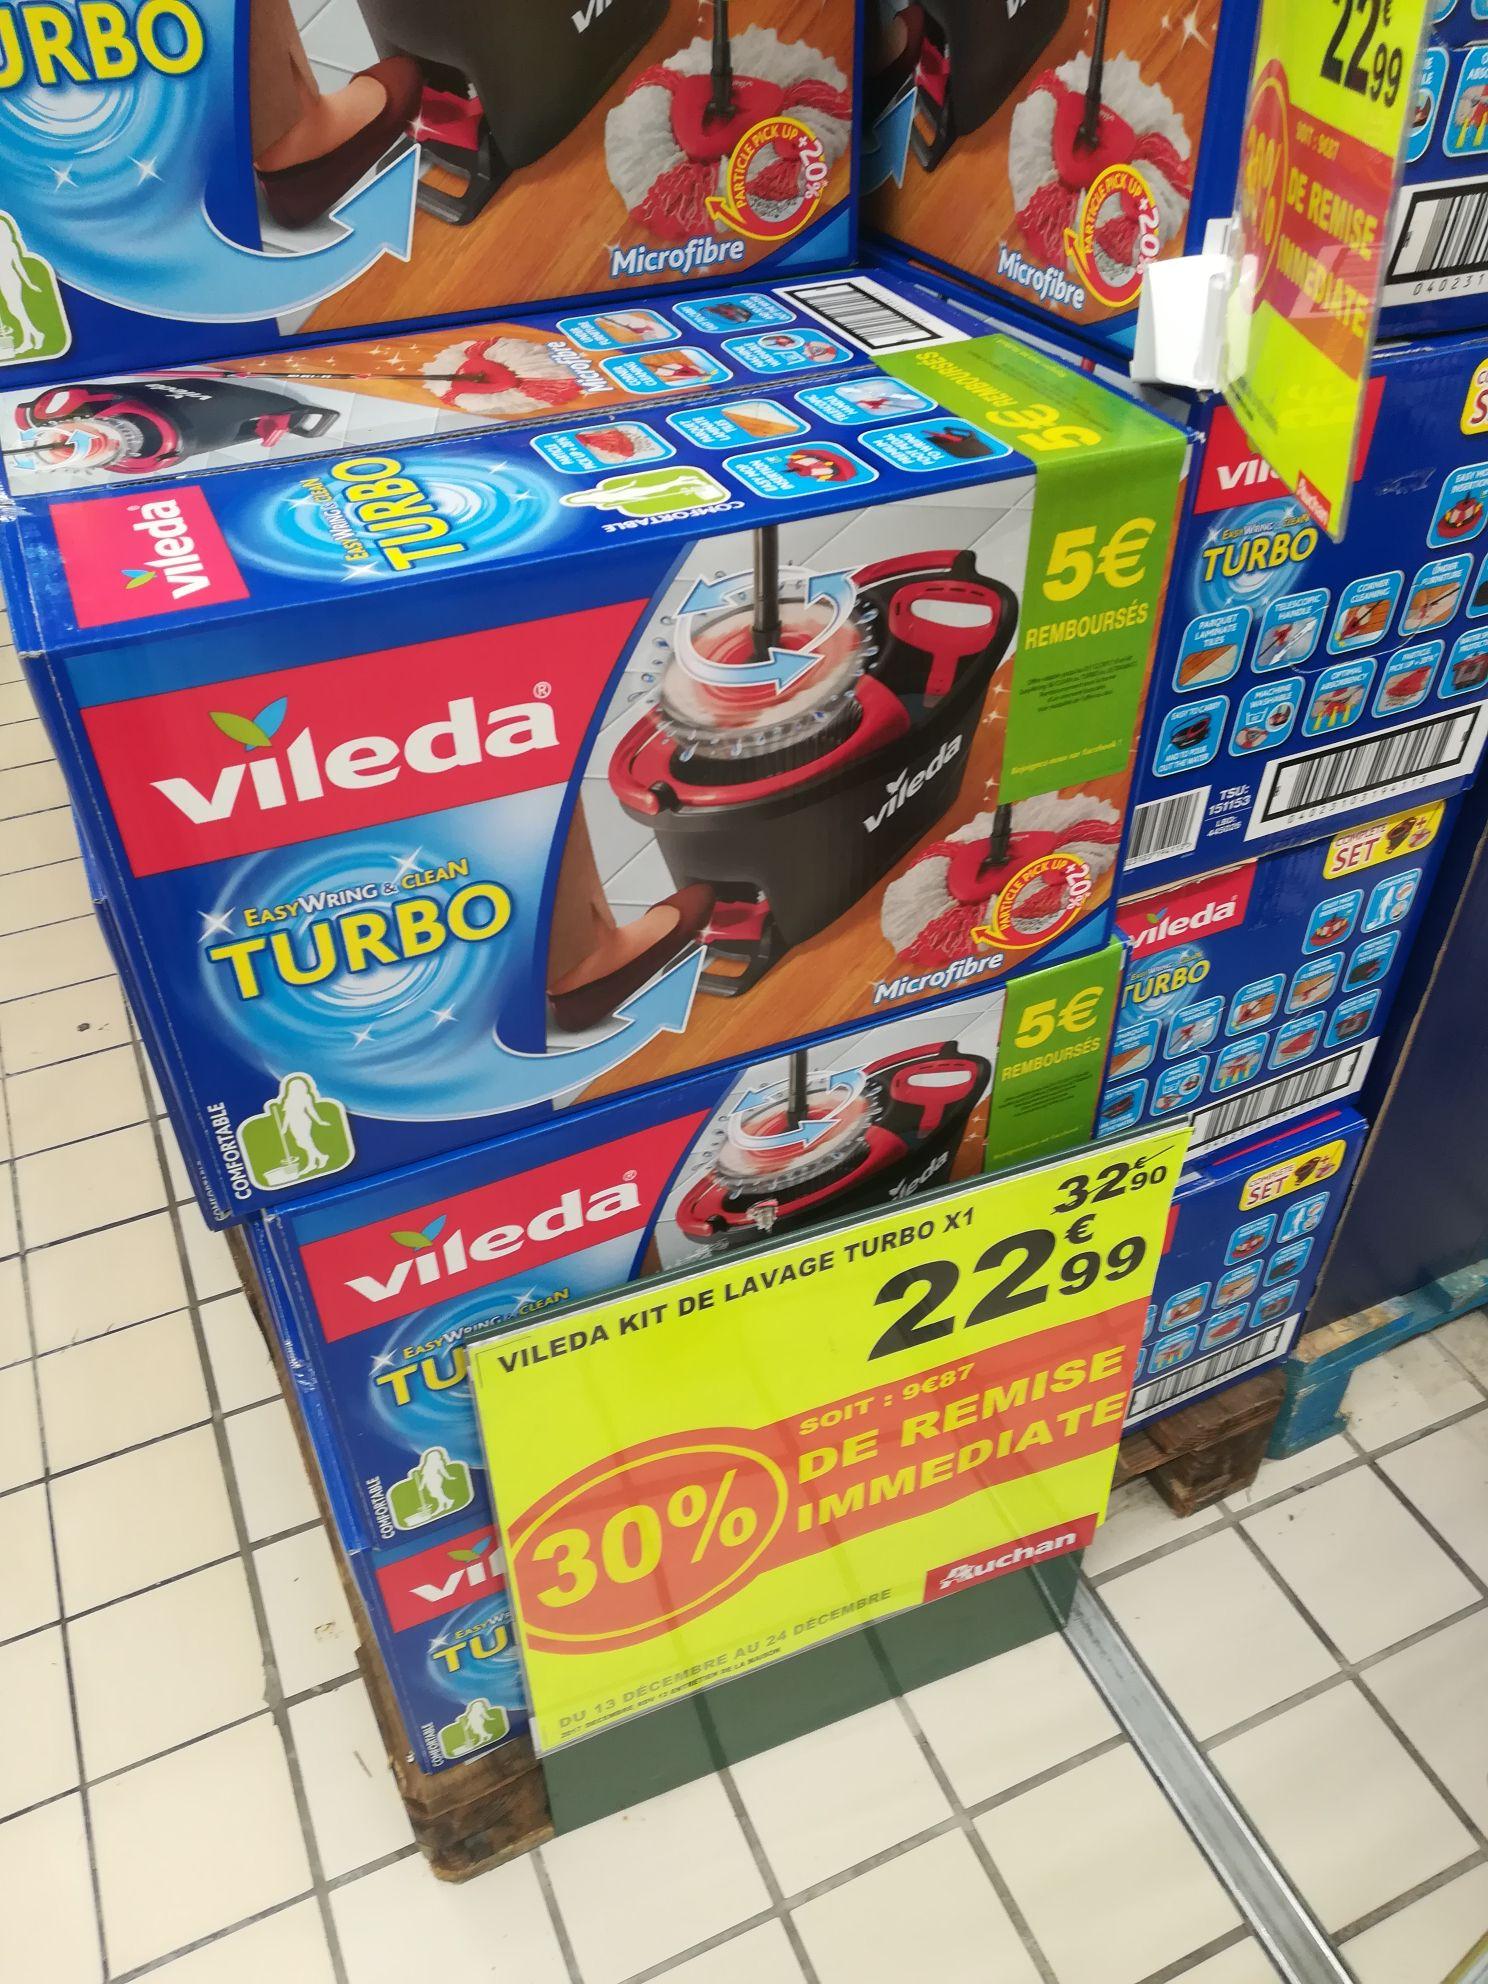 Kit de lavage balai + seau Vileda Easy Wring And Clean Turbo - Epagny (74)